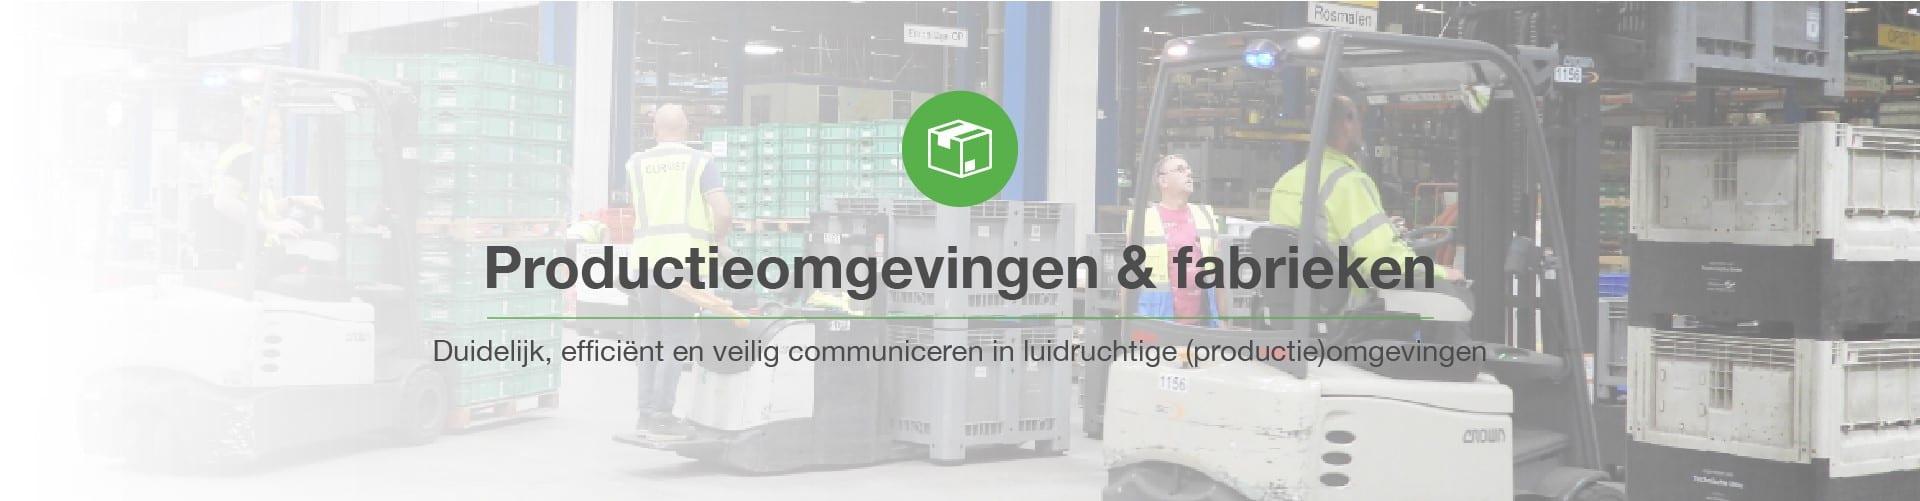 axiwi-duplex-communicatiesysteem-productieomgeving-fabriek